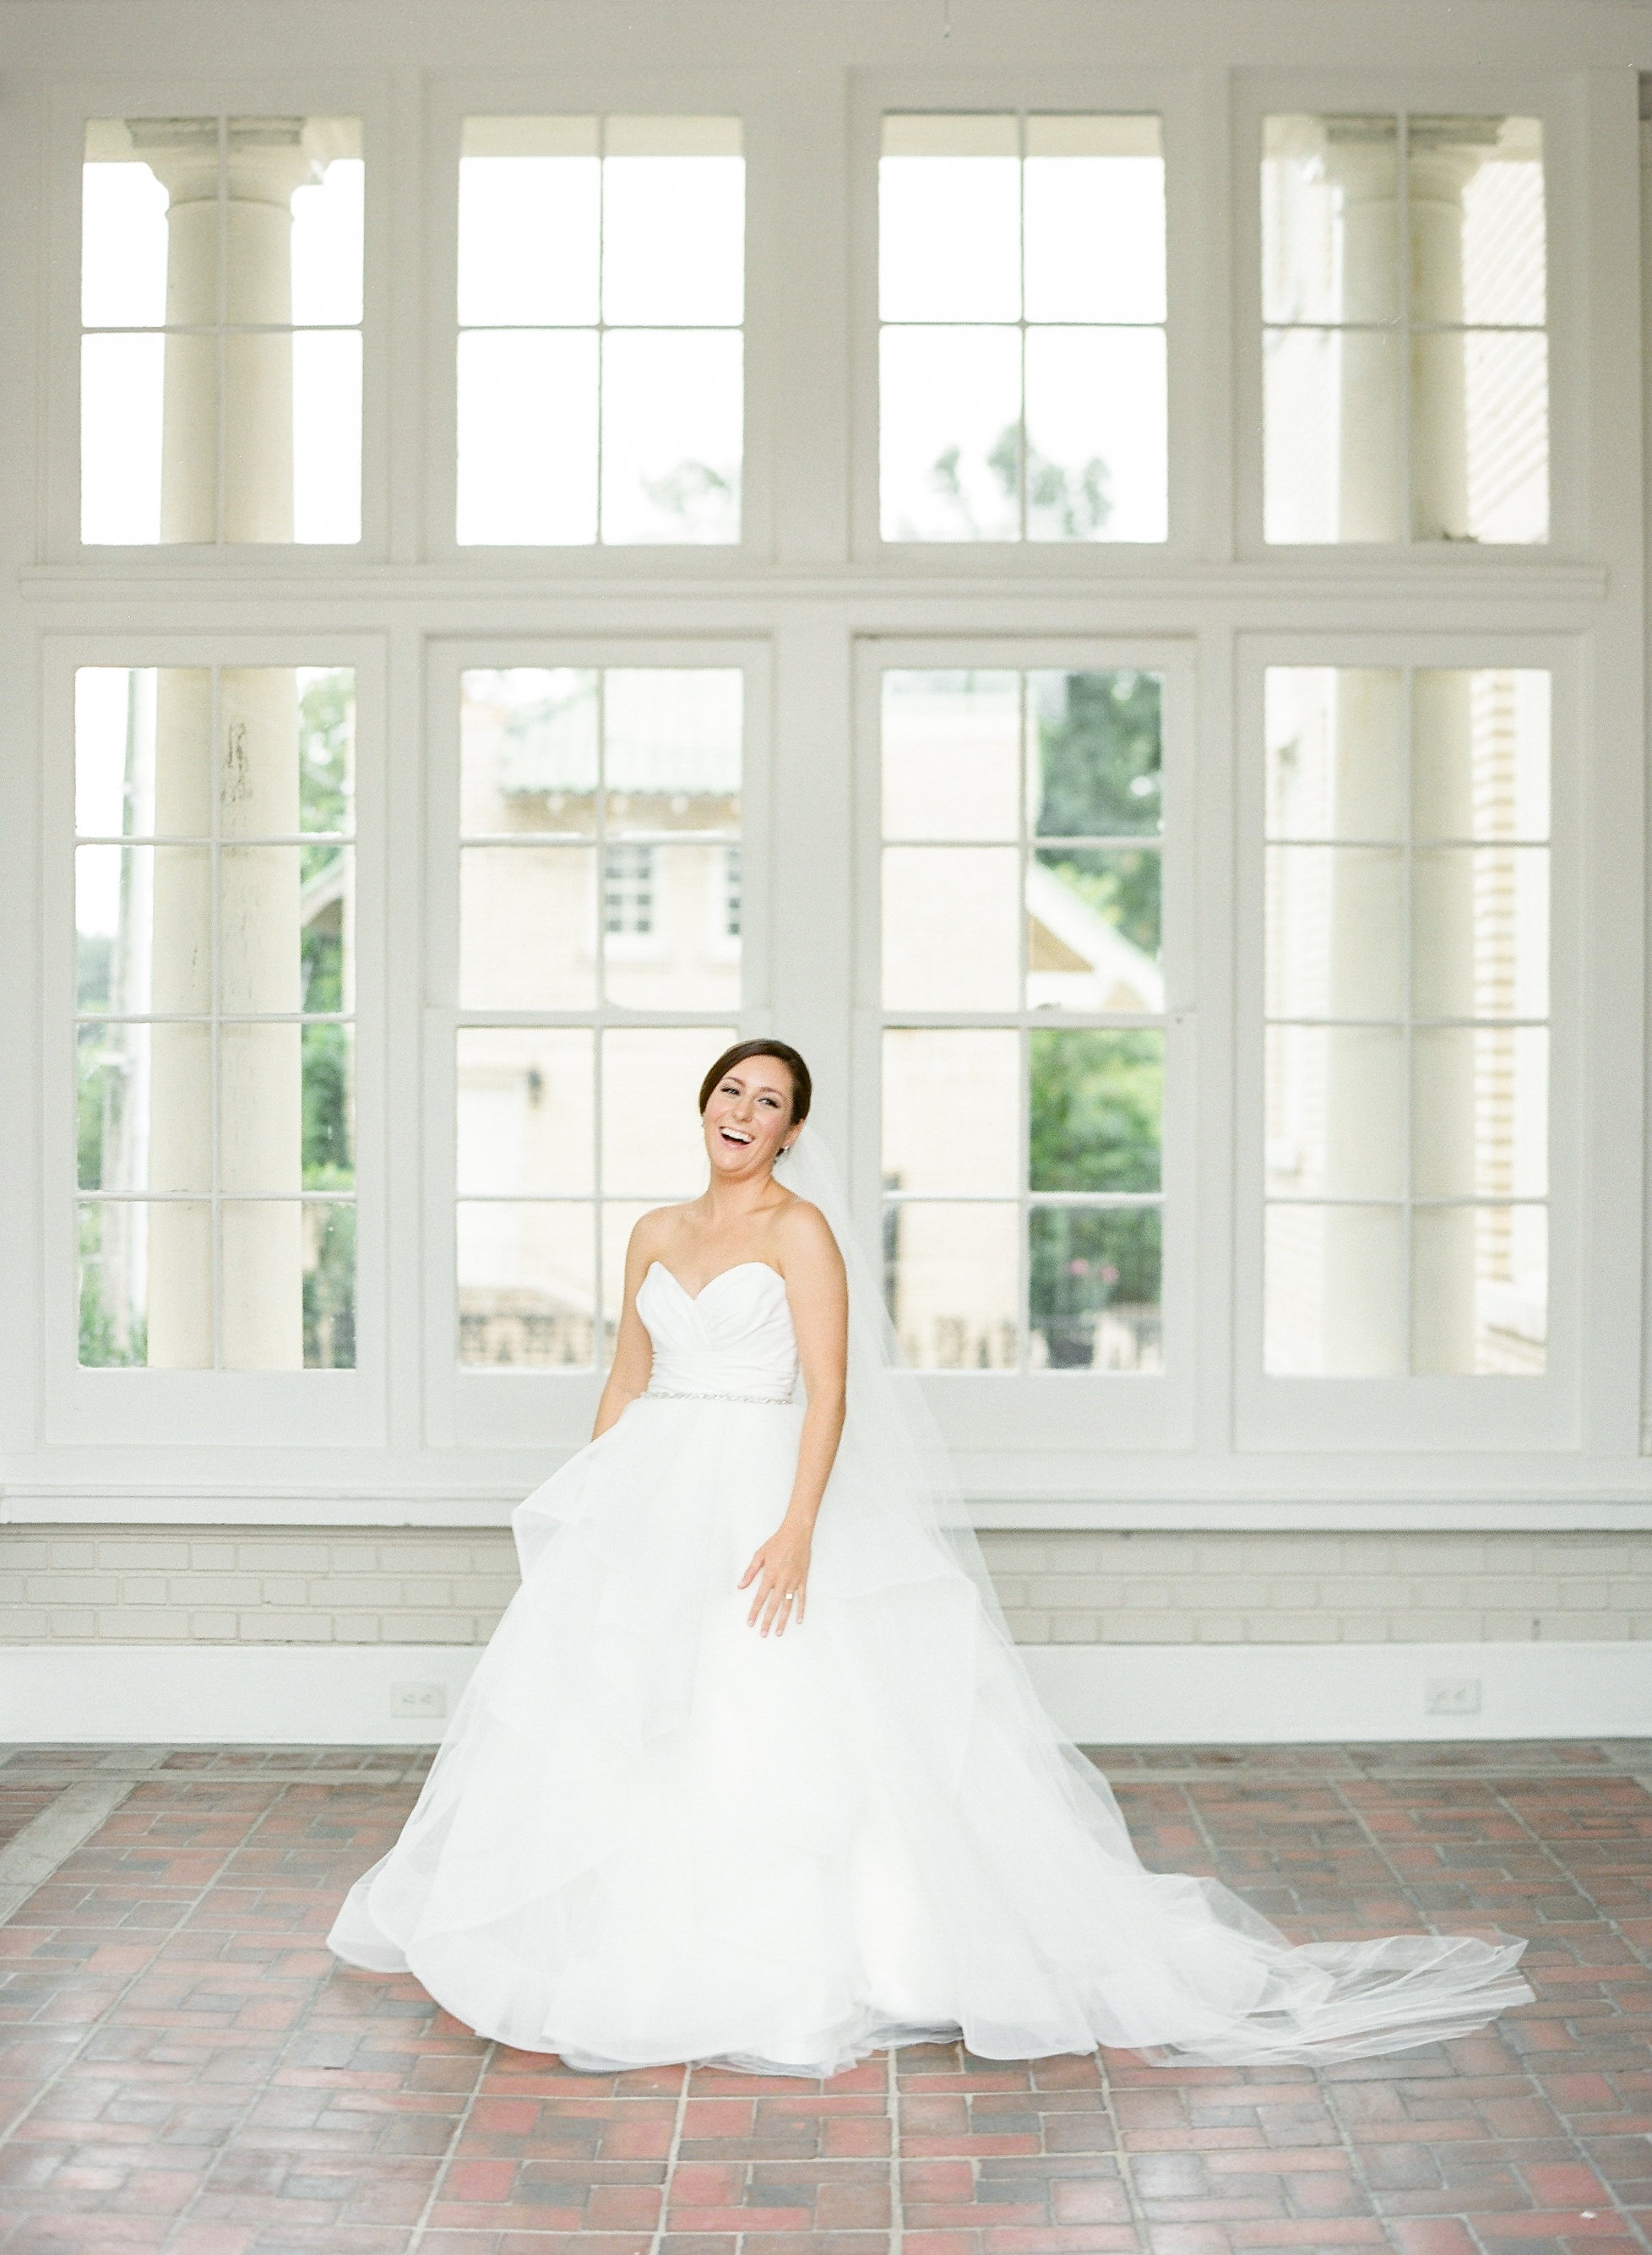 North-Carolina-Bridal-Photographer-Rebecca-1.jpg